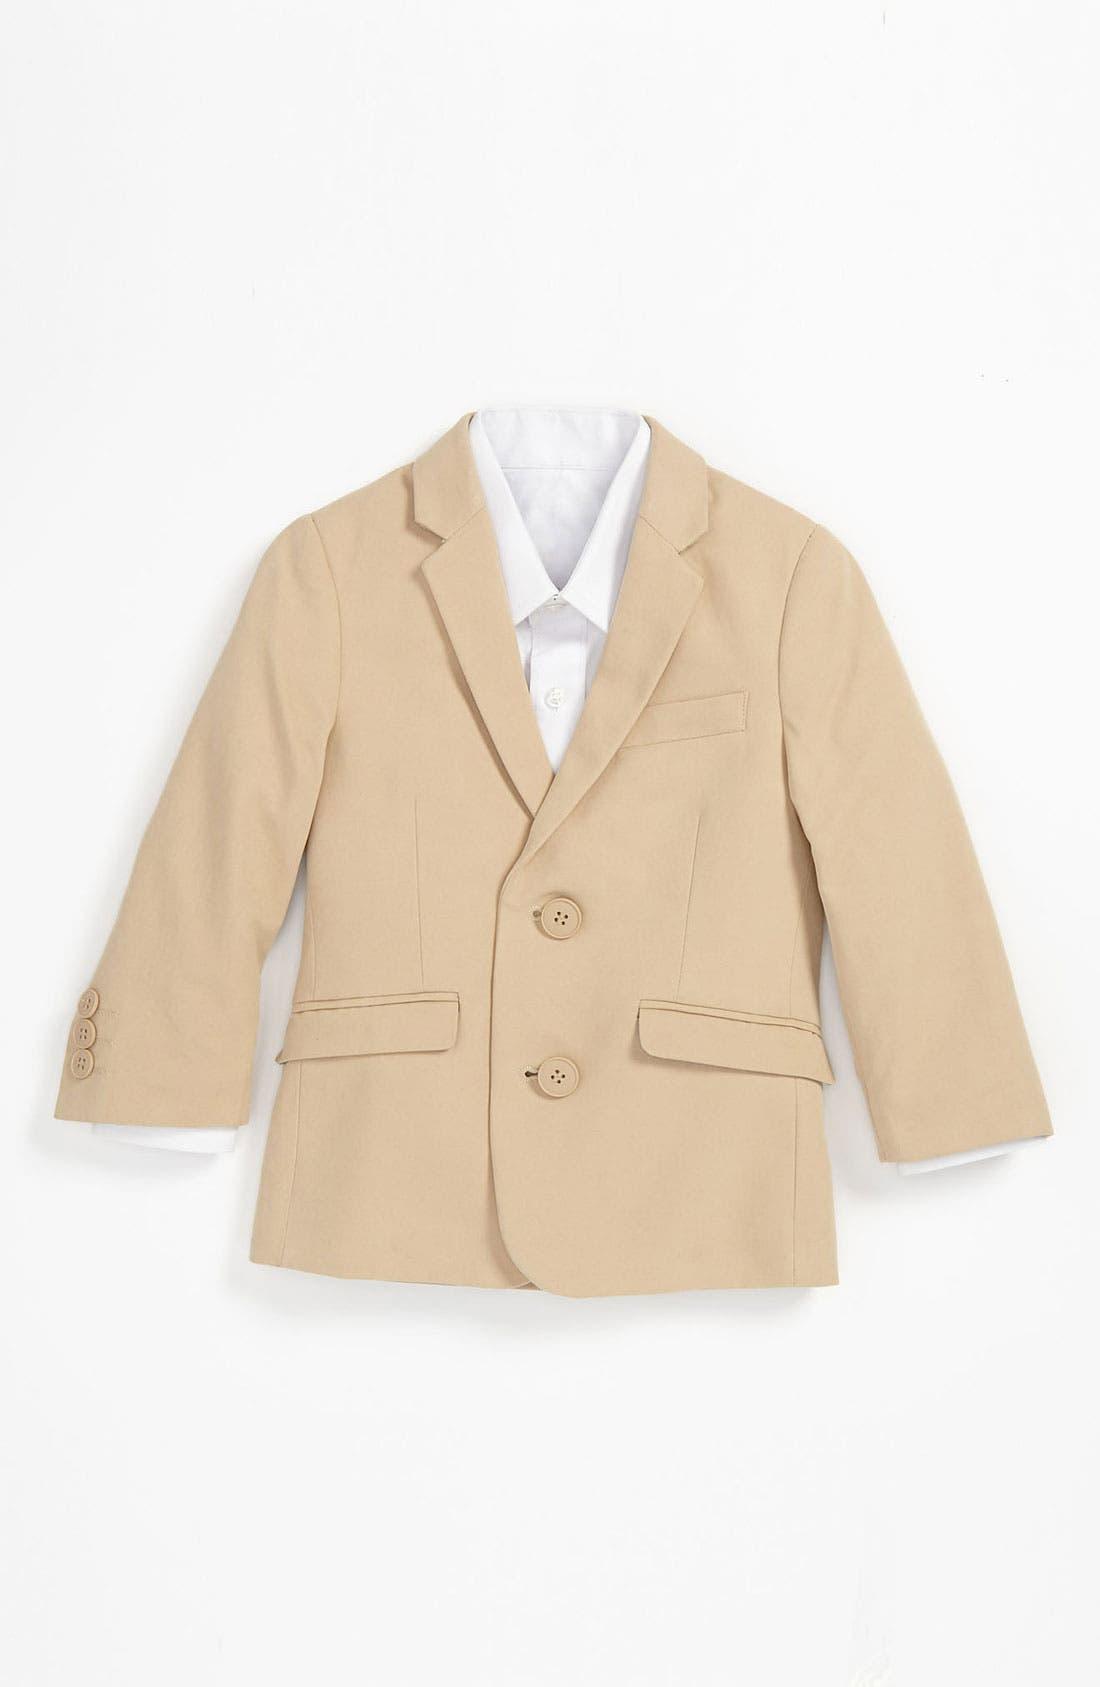 Main Image - Appaman Suit Jacket (Toddler)